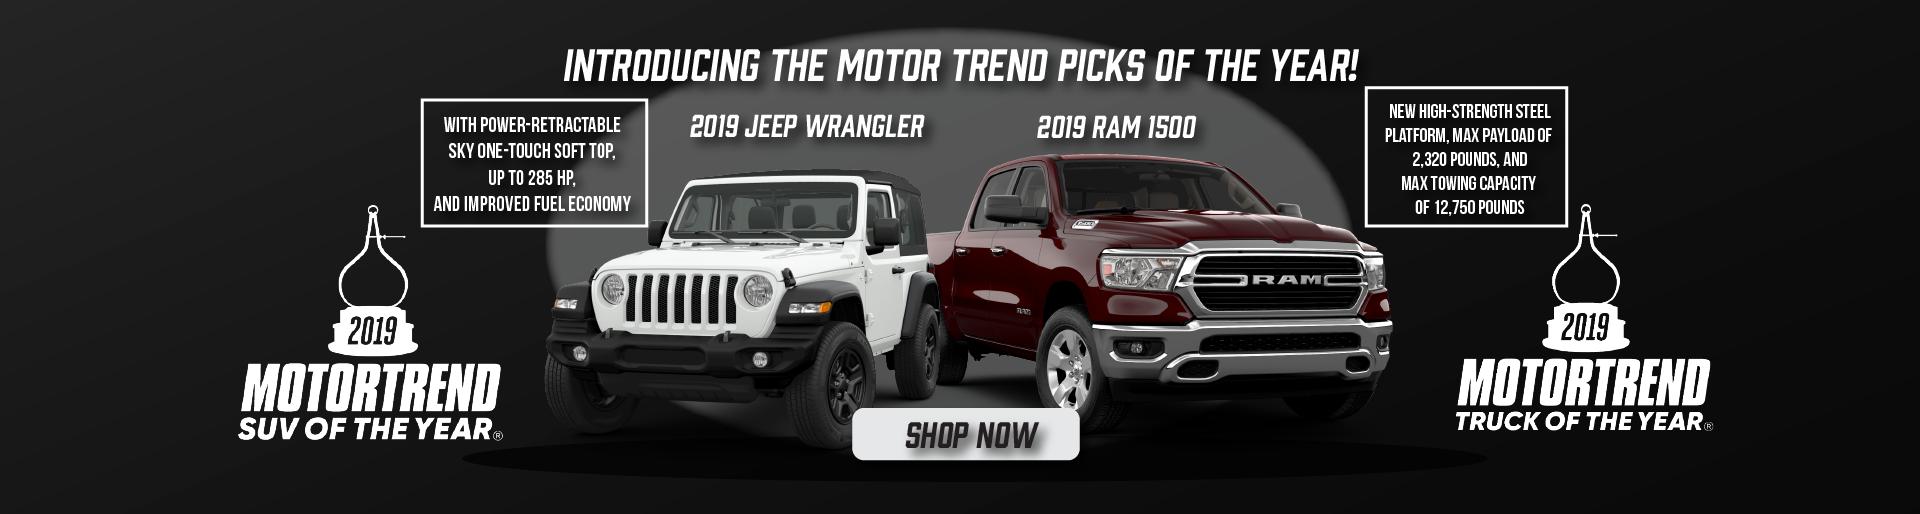 Tanner Motors | Chrysler, Dodge, Jeep, Ram Dealer in